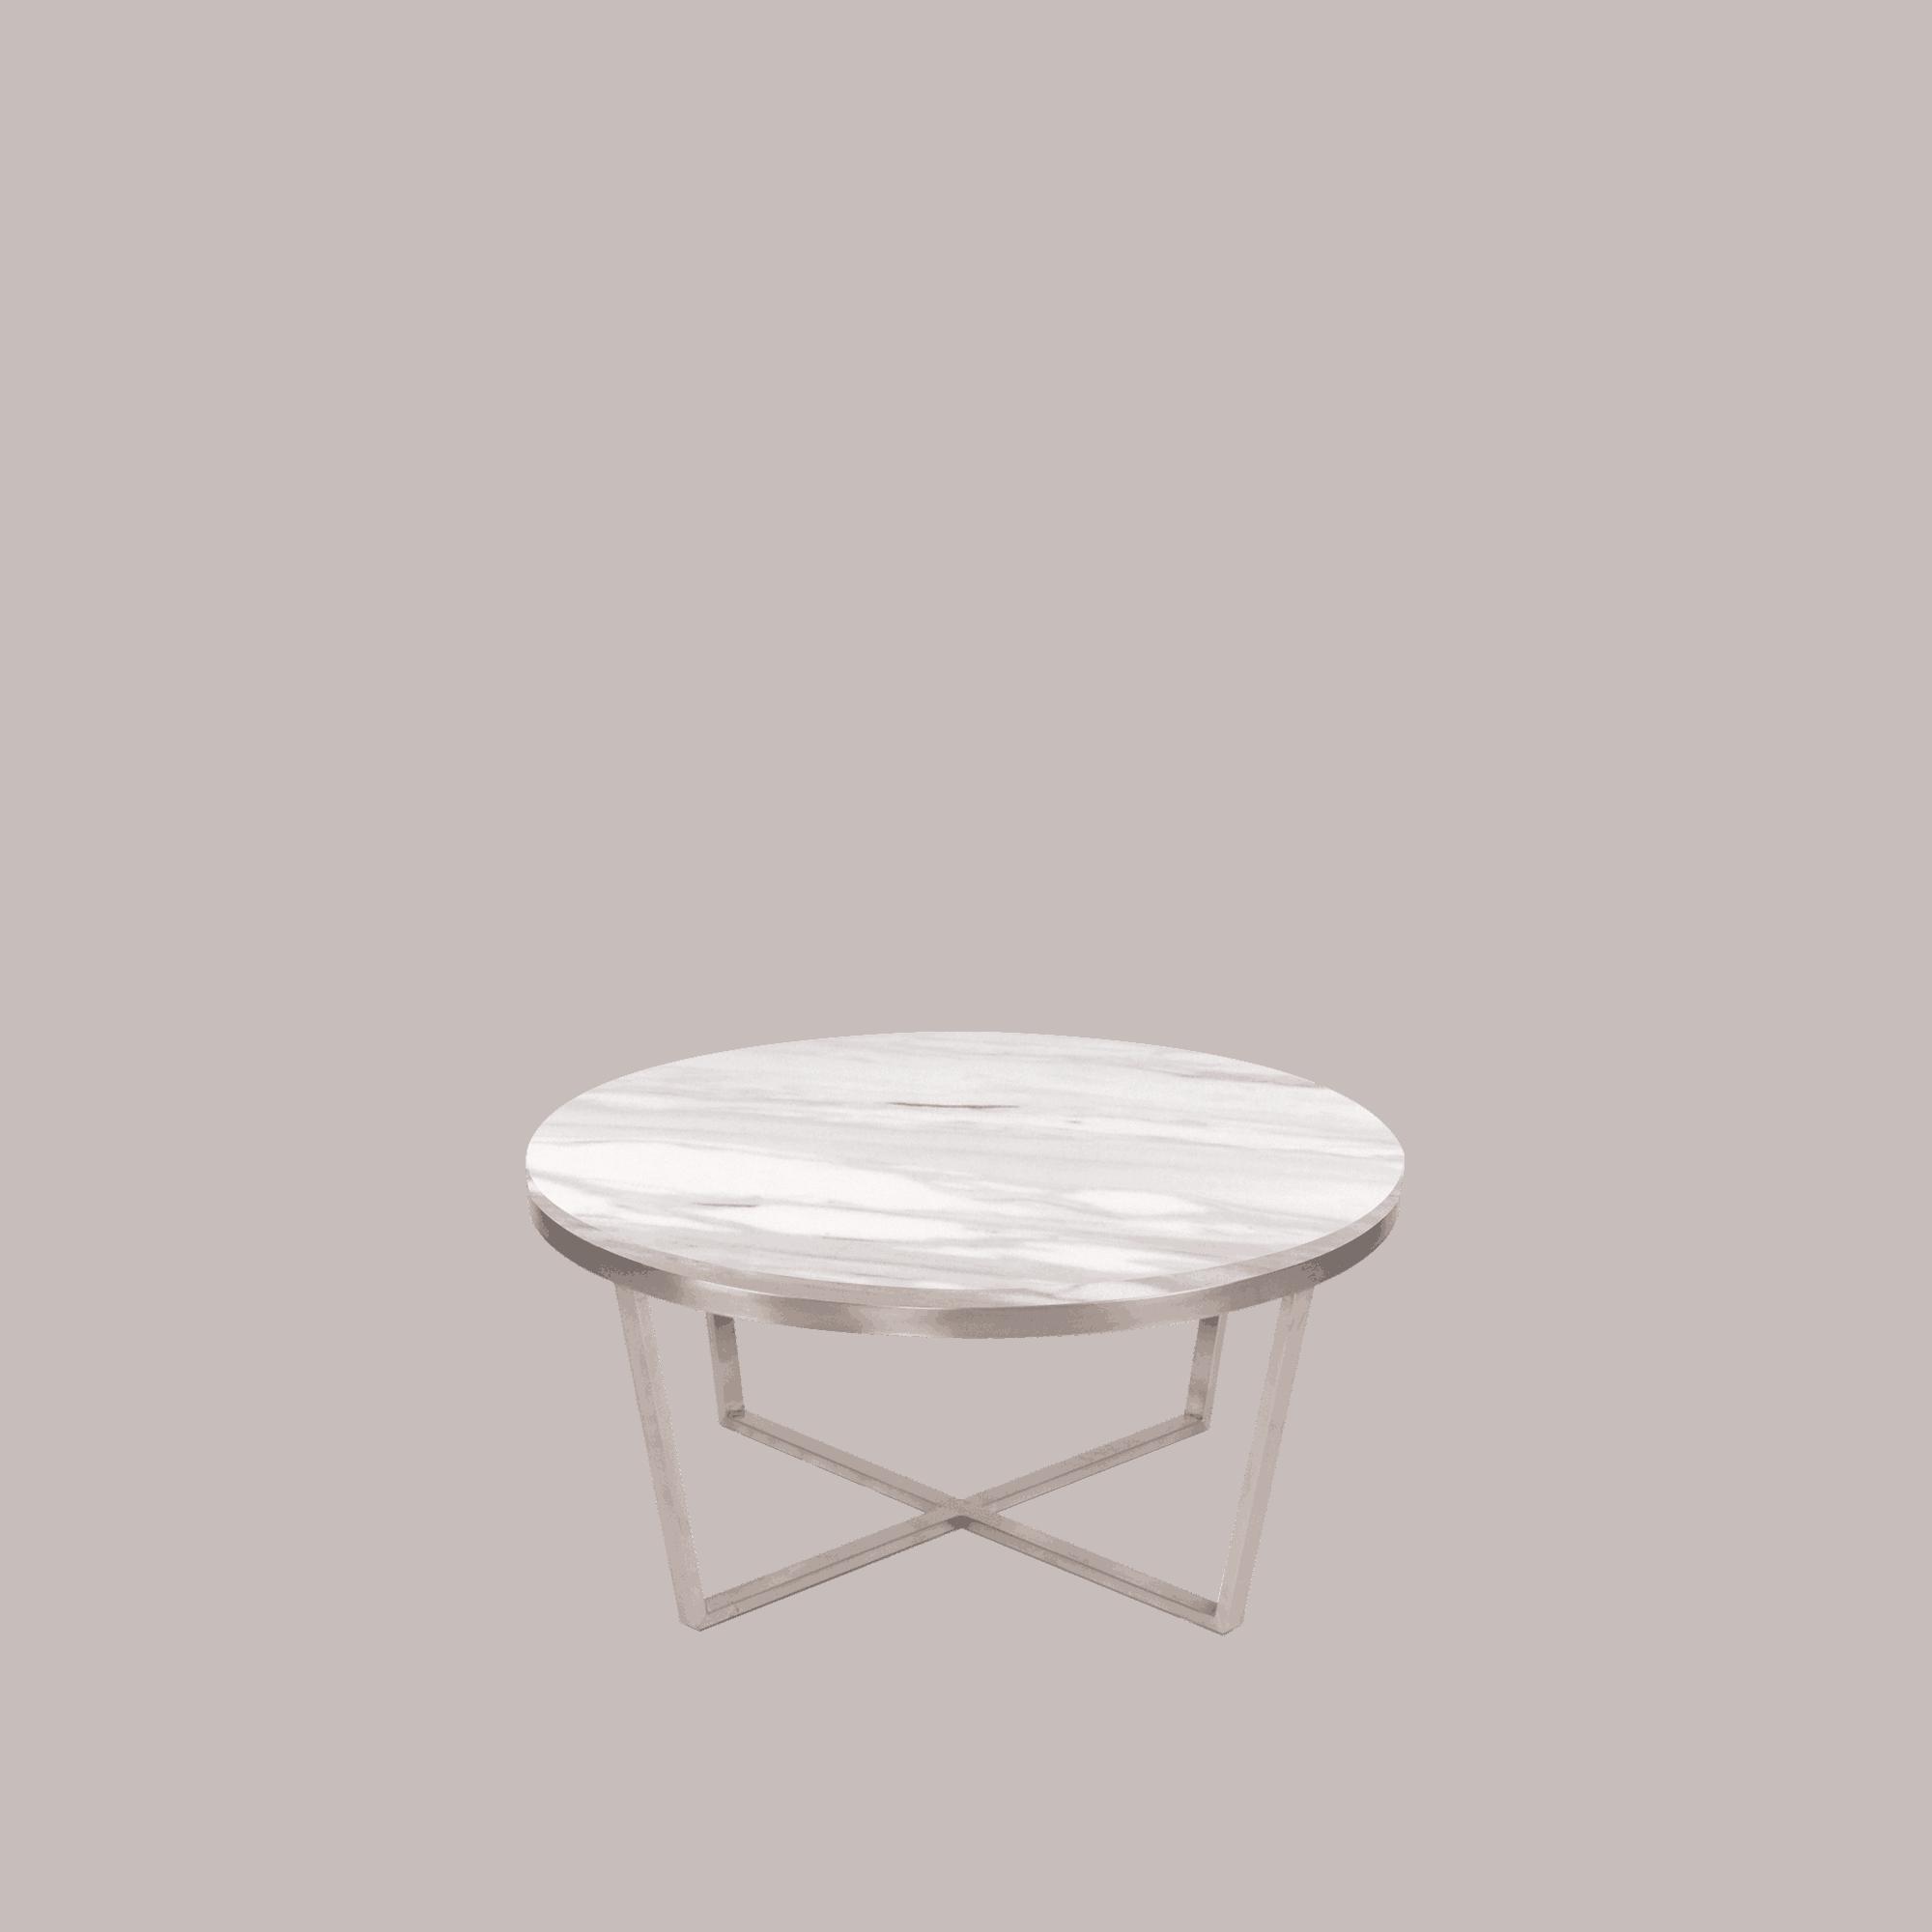 Lorenz Round Marble Coffee Table: Round Marble Coffee Table Volakas